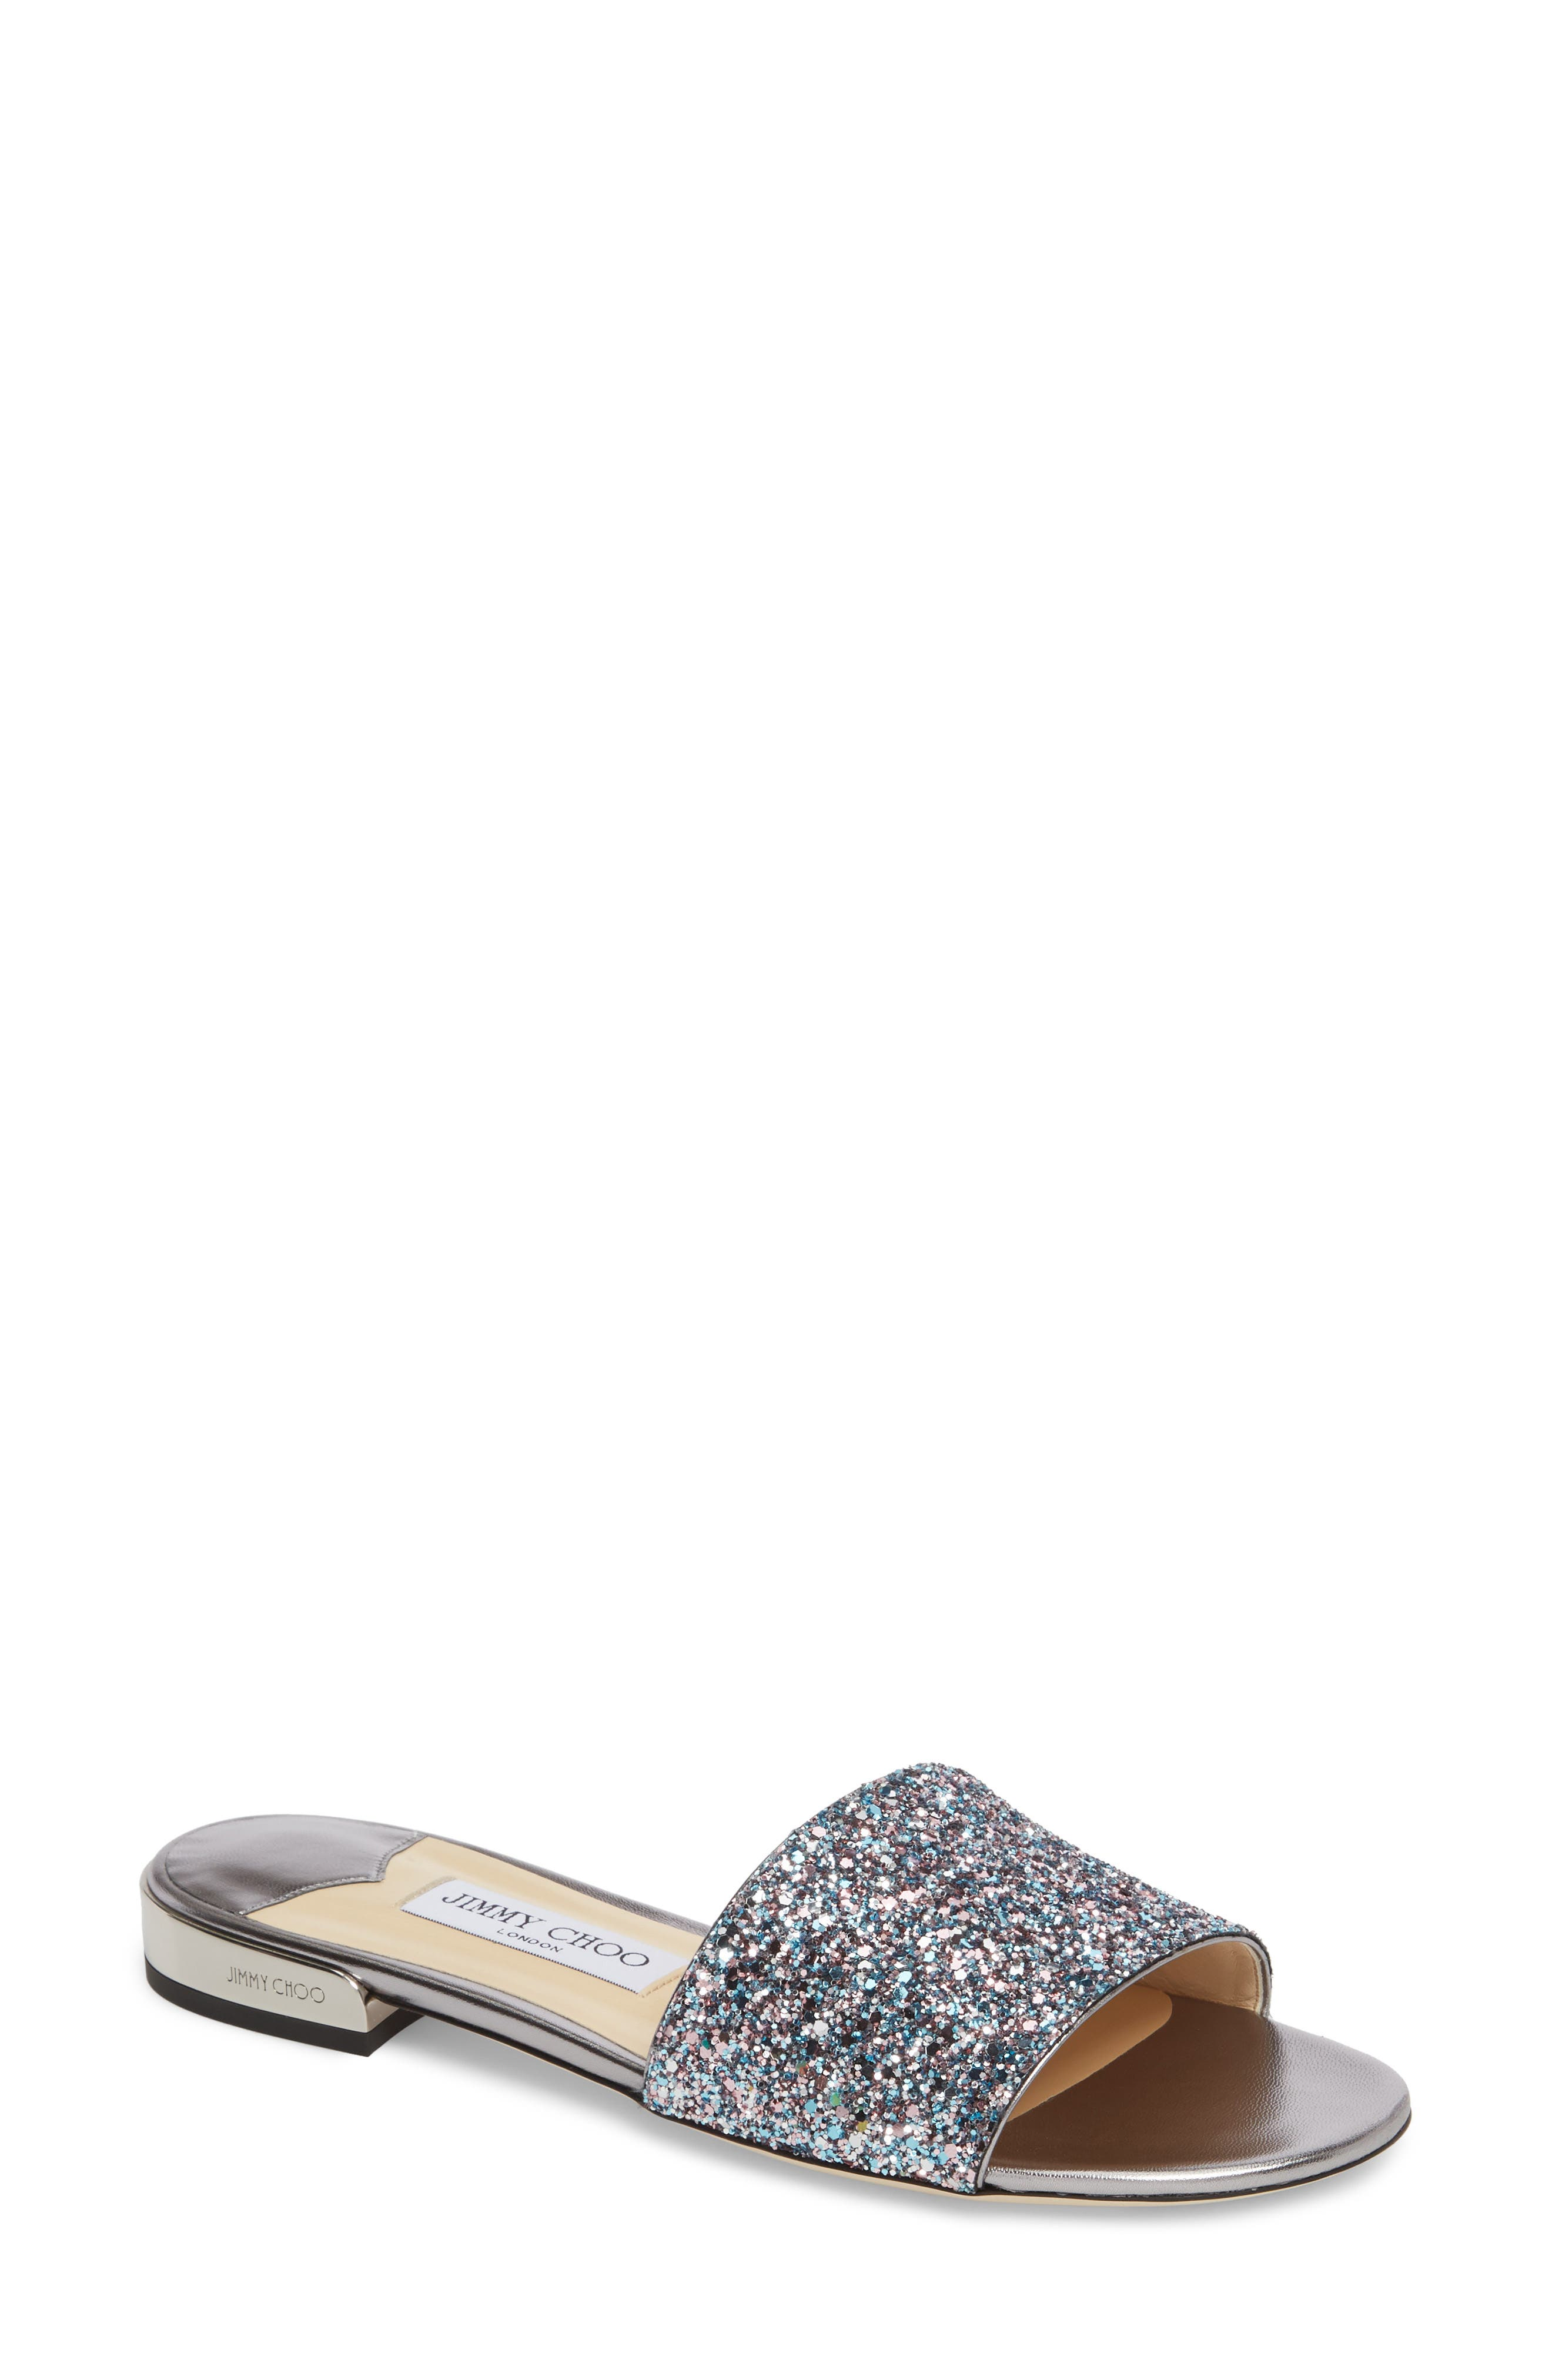 Jimmy Choo Joni Embellished Slide Sandal - Metallic